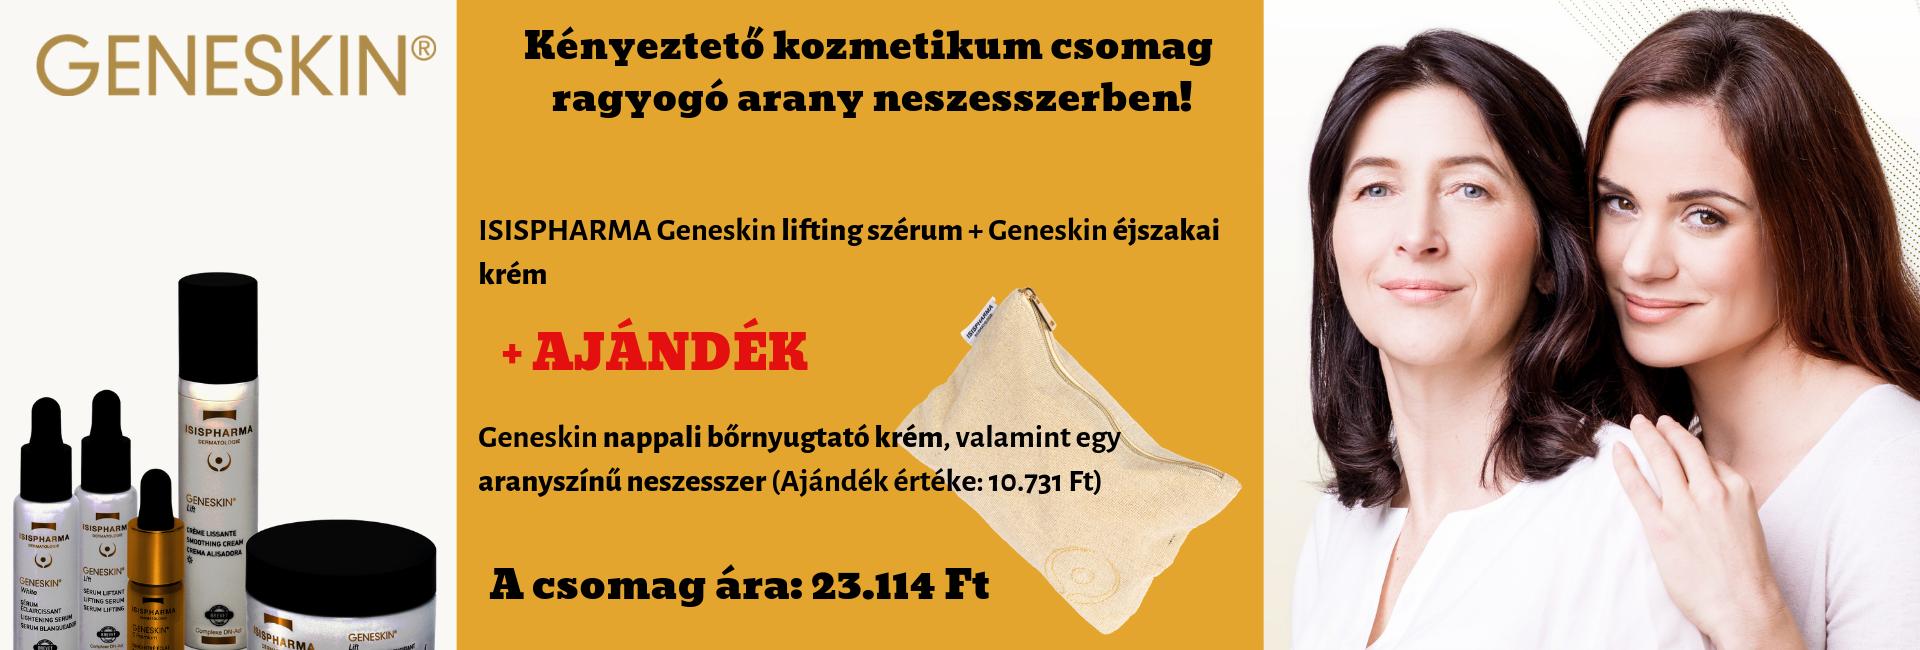 geneskin_2018_dec